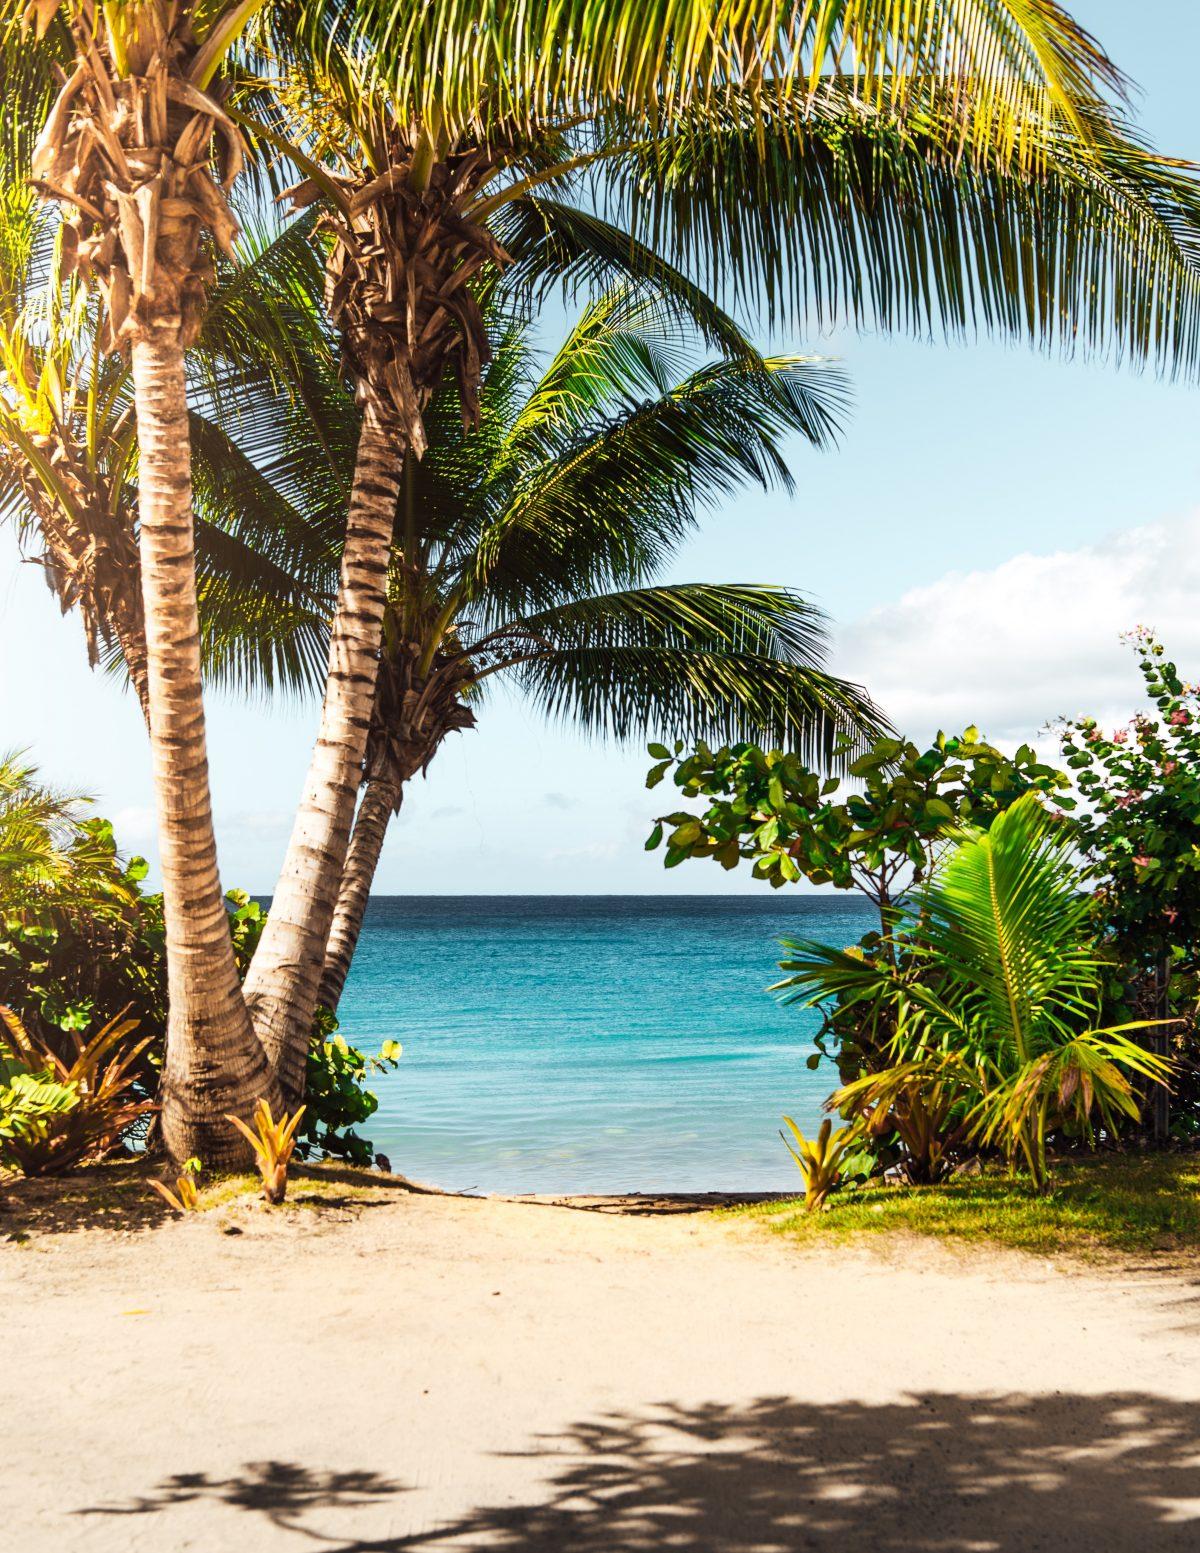 matthew brodeur DH u2aV3nGM unsplash - 5 Best Beaches In Puerto Rico To Visit On Your Trip